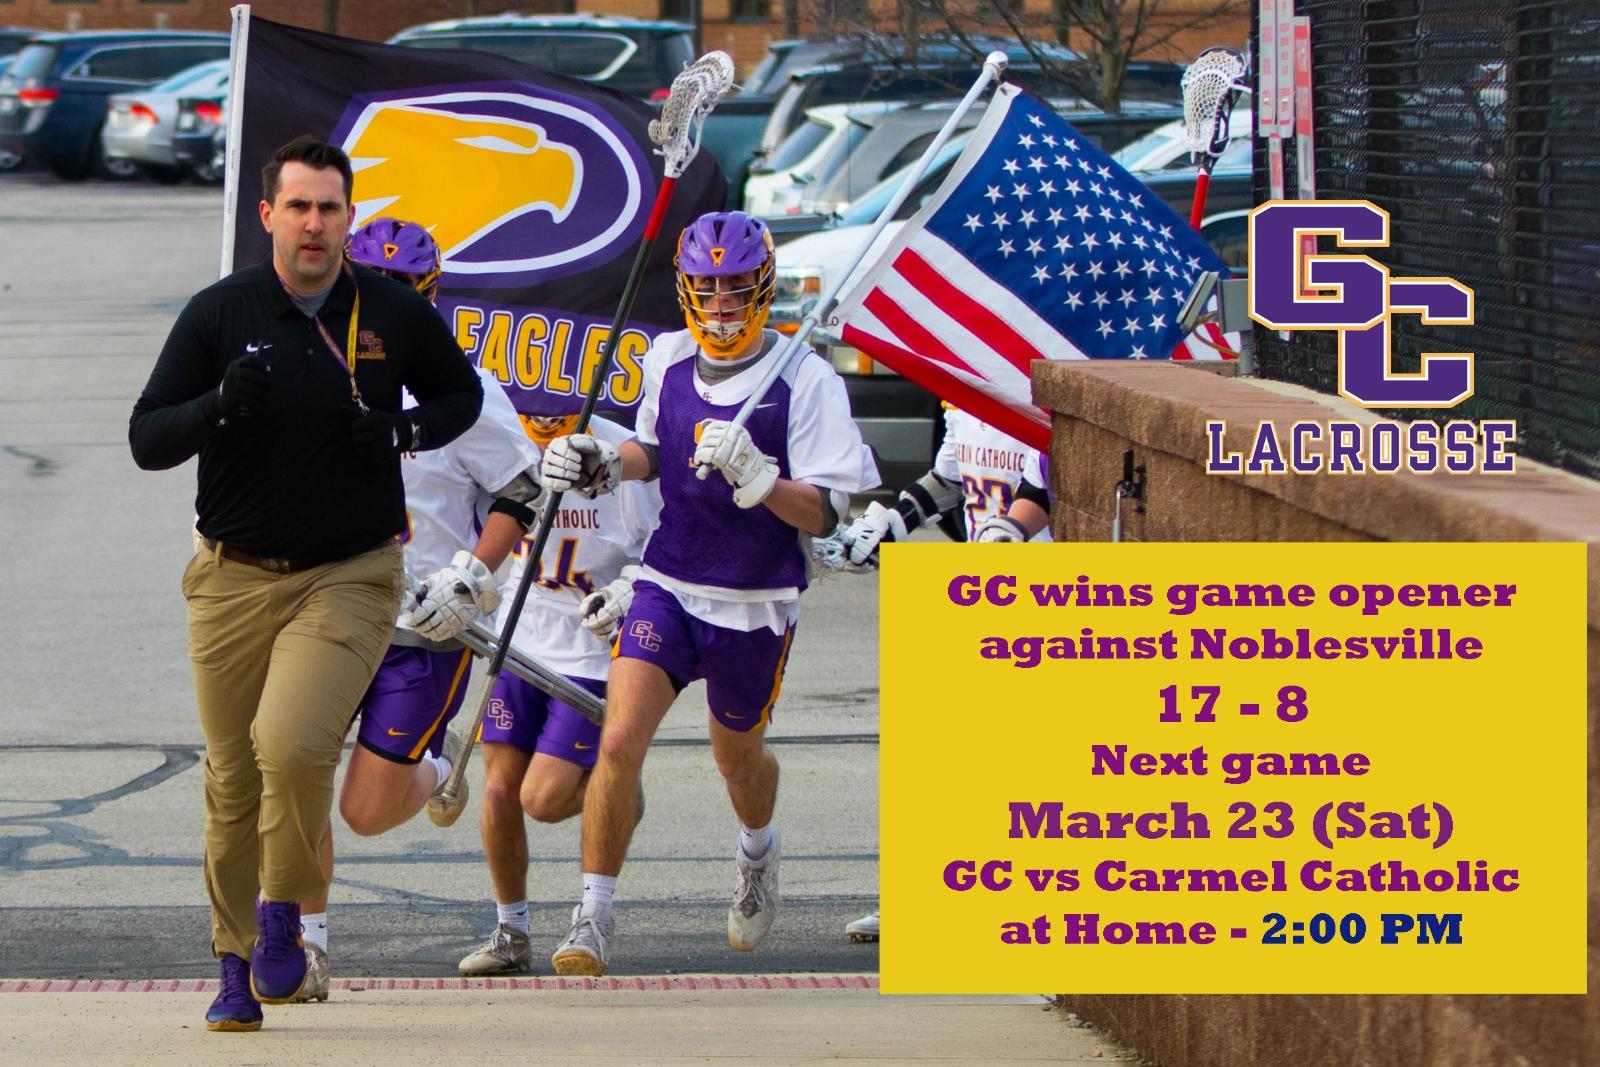 GC Lax  JV & Varsity: WINS season opener against Noblesville – Game tomorrow at 2:00pm – Carmel Catholic